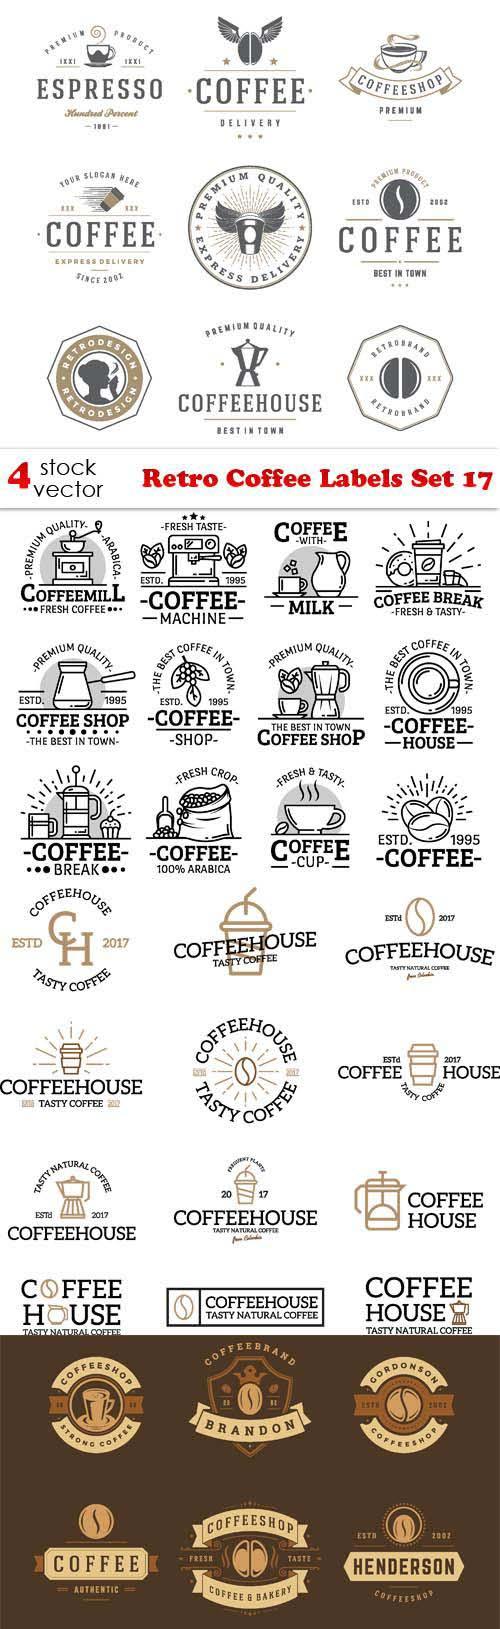 Retro Coffee Labels Set 17